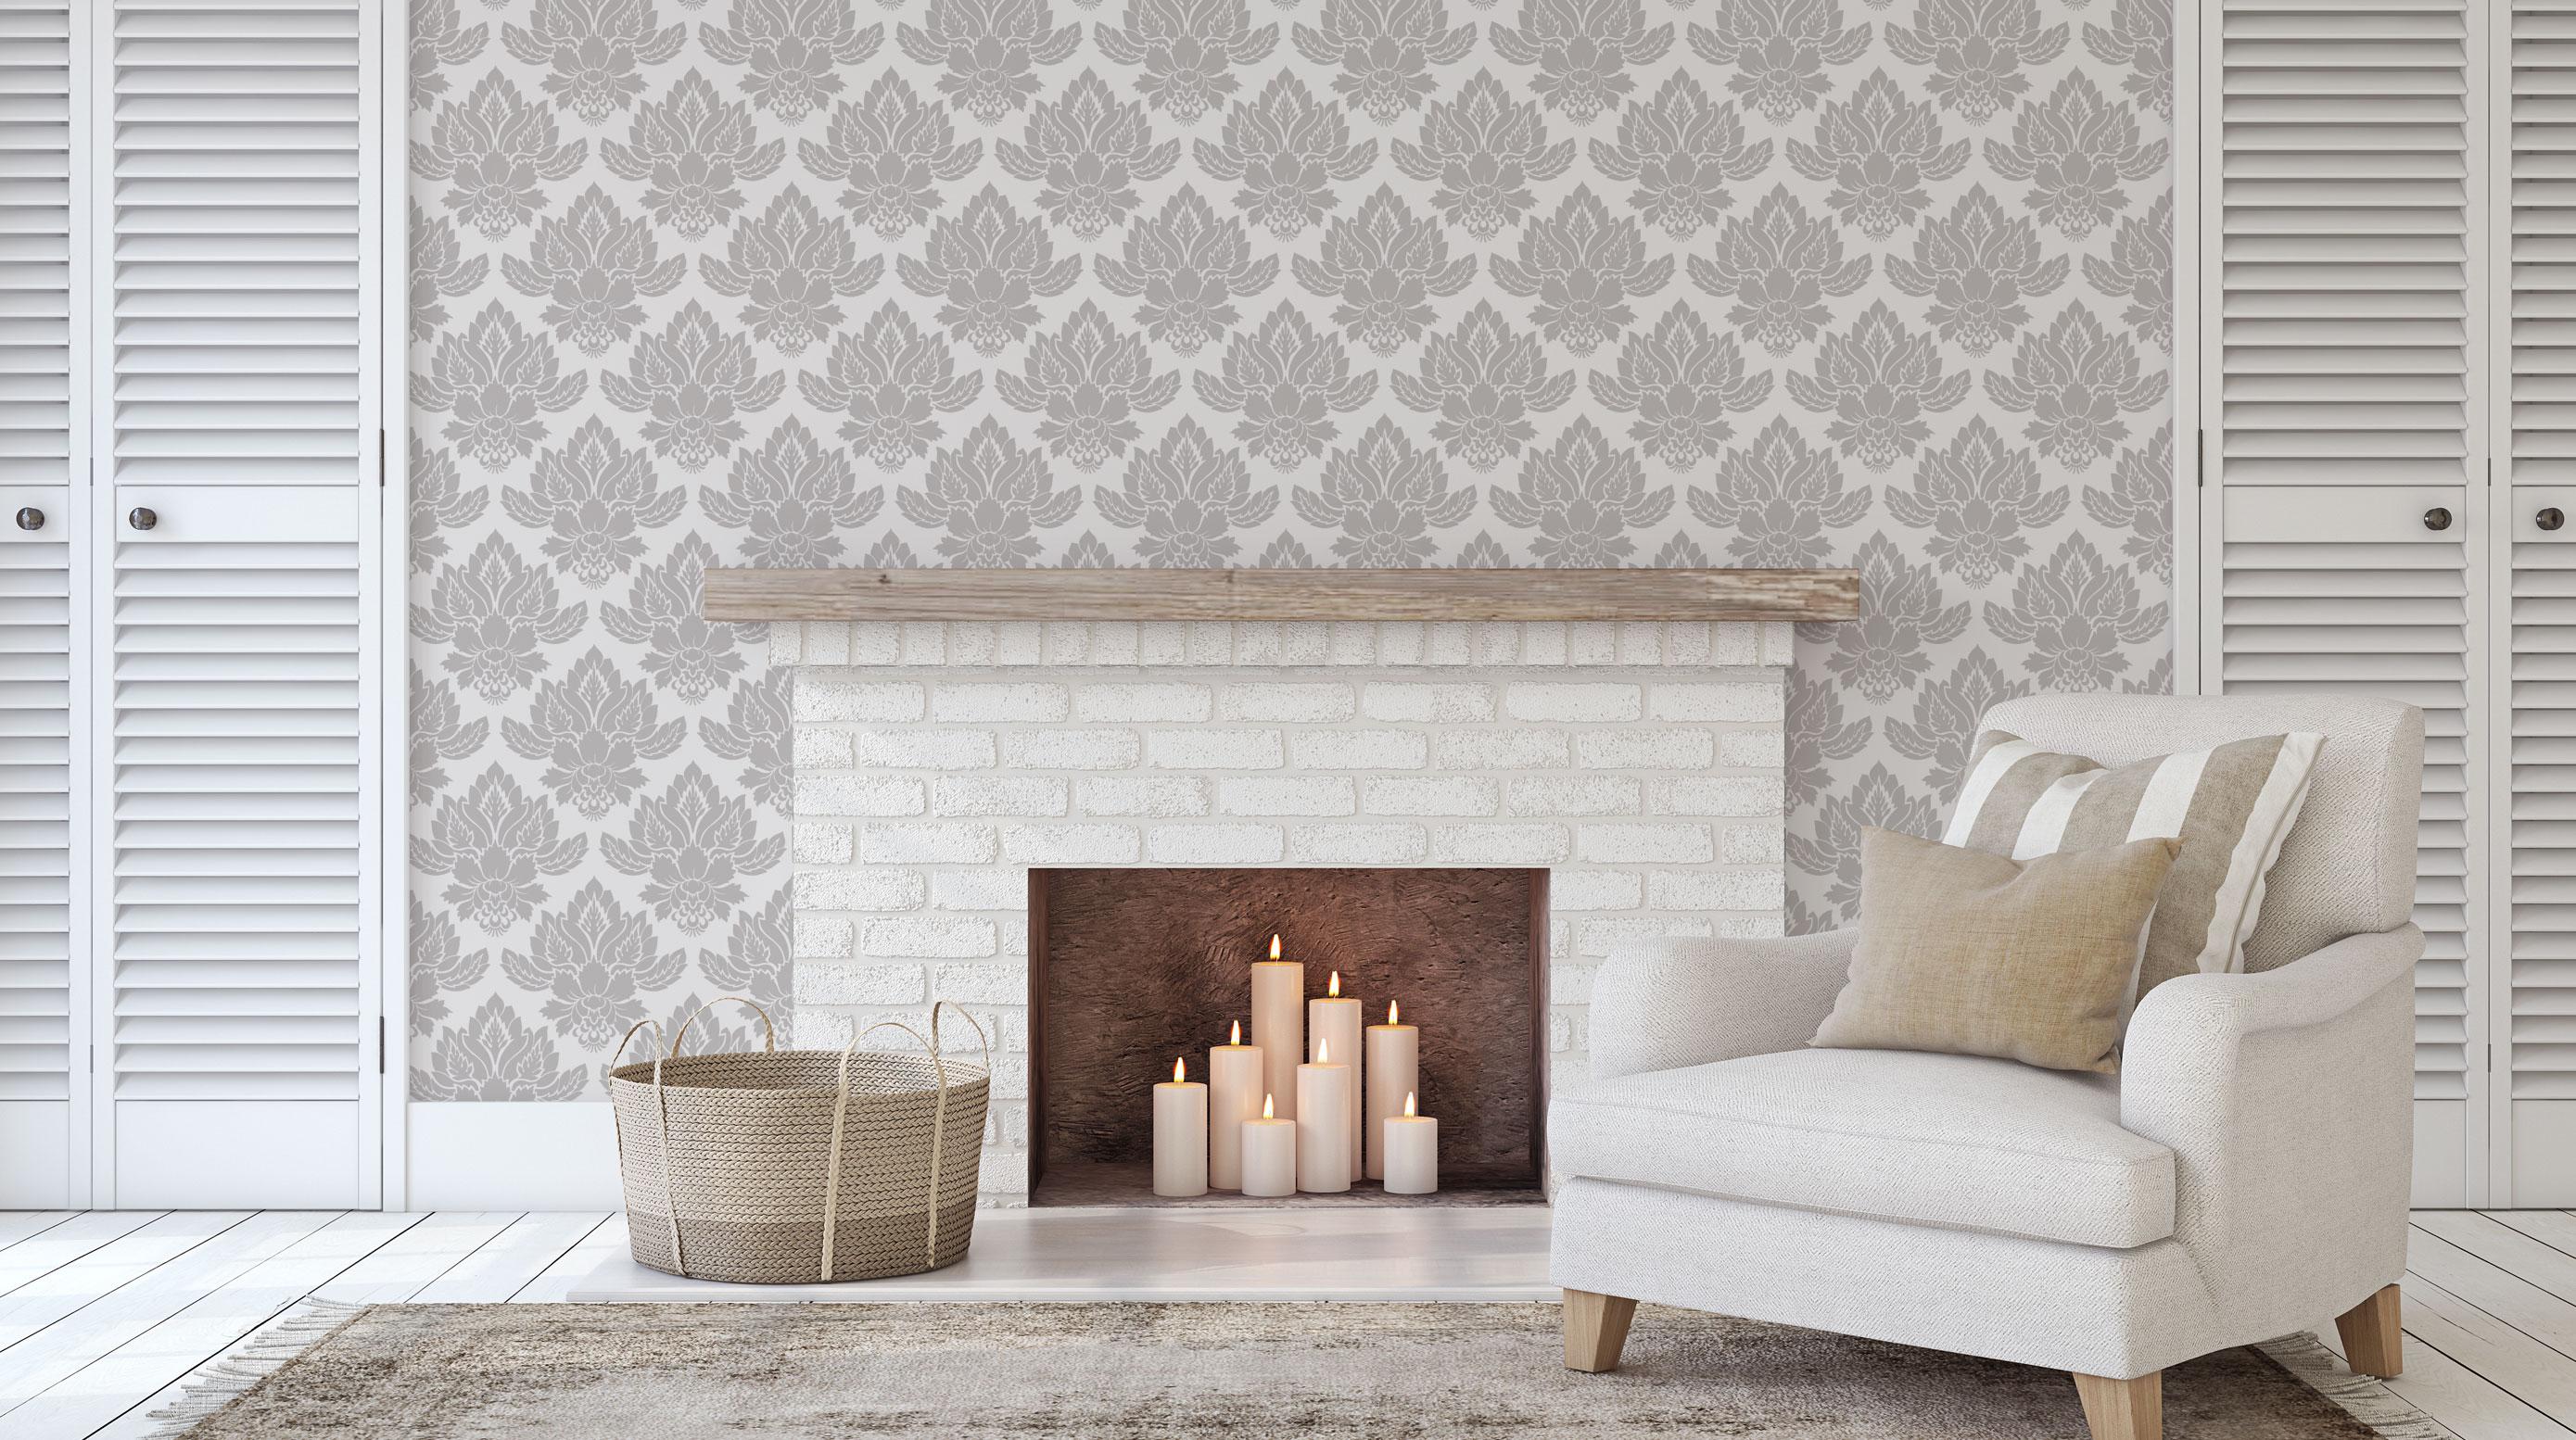 Transform Your Room with Designer Stencils